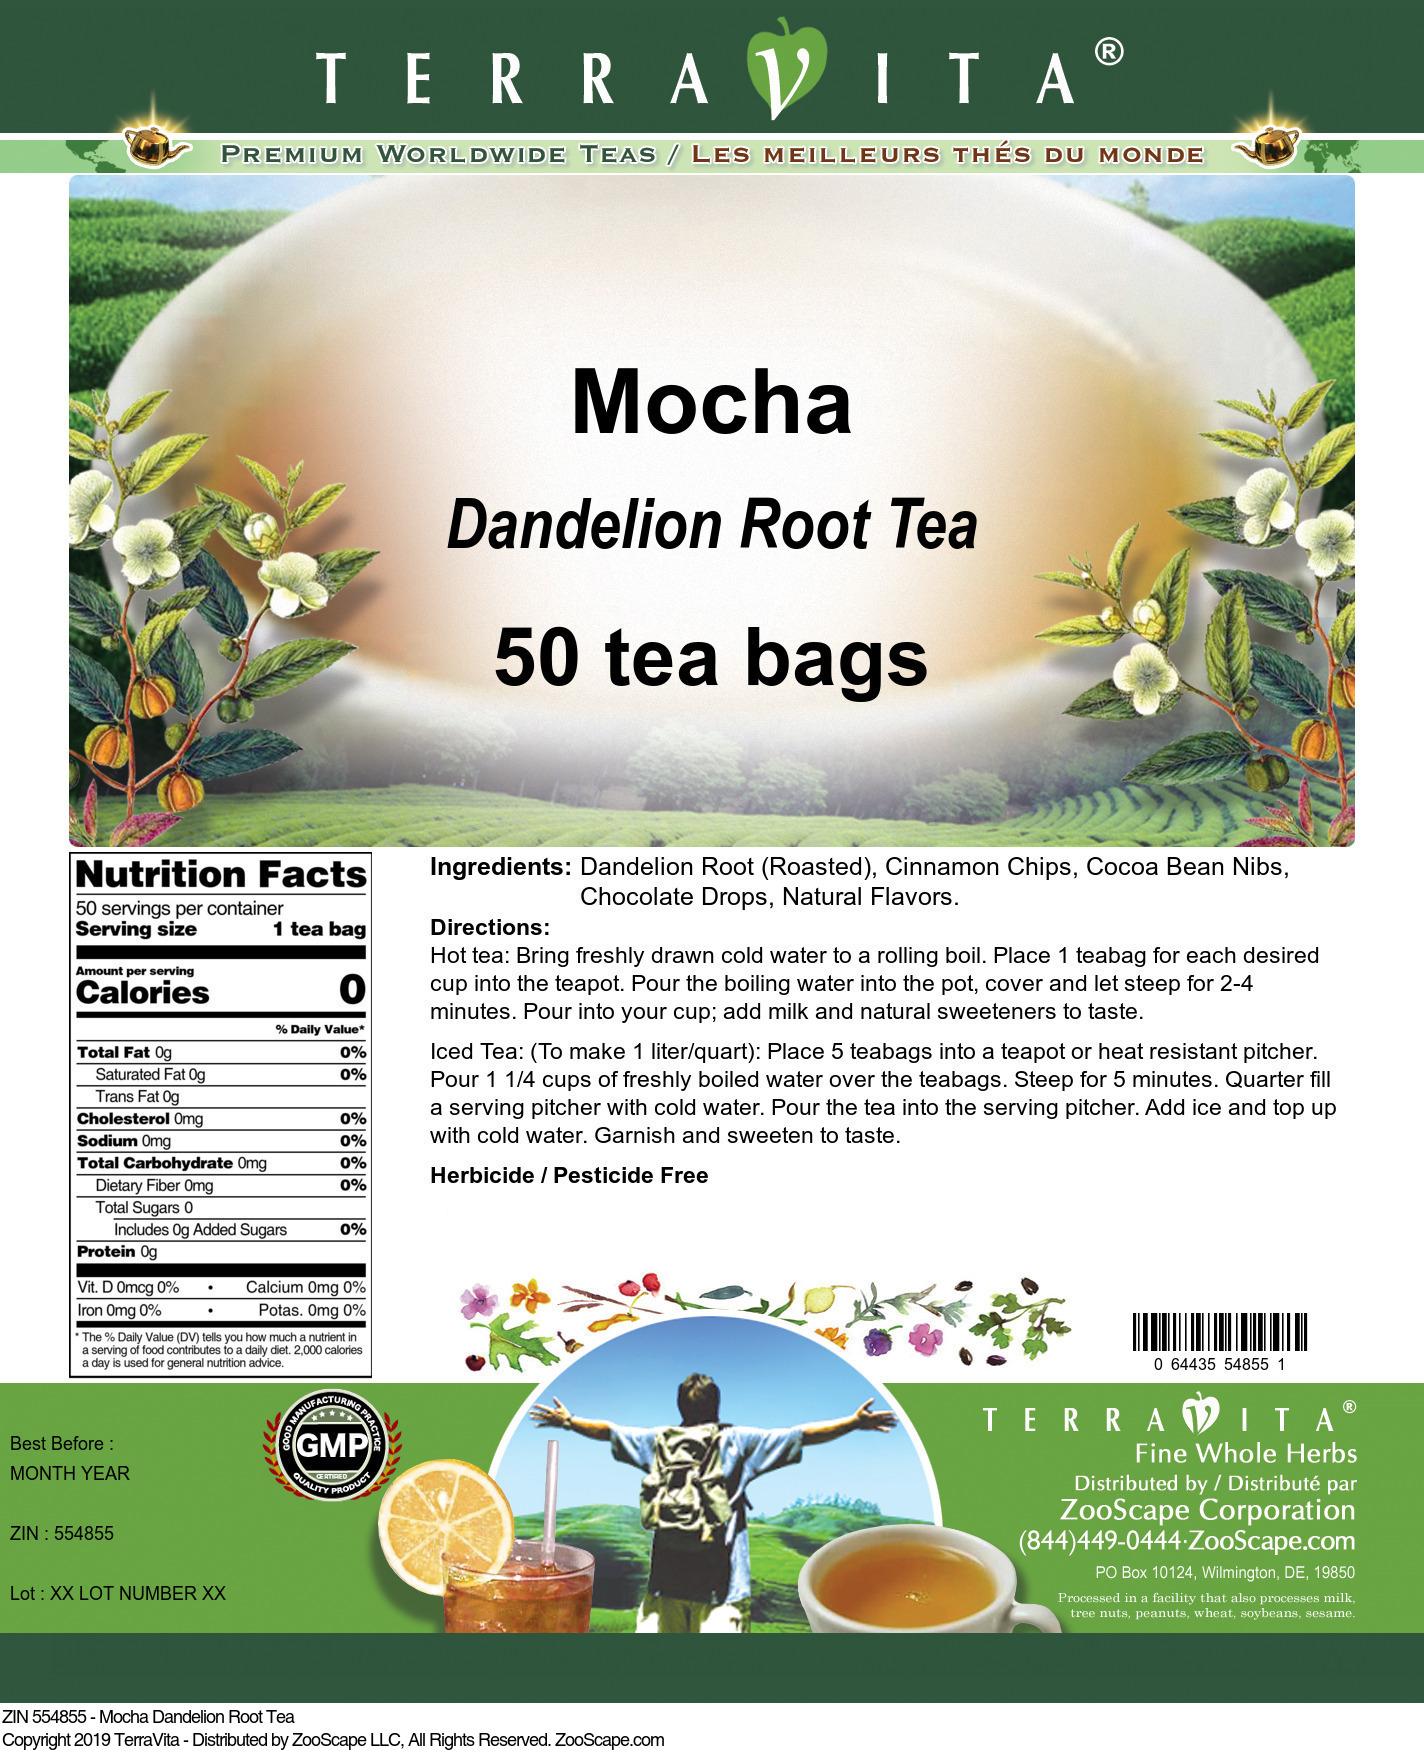 Mocha Dandelion Root Tea